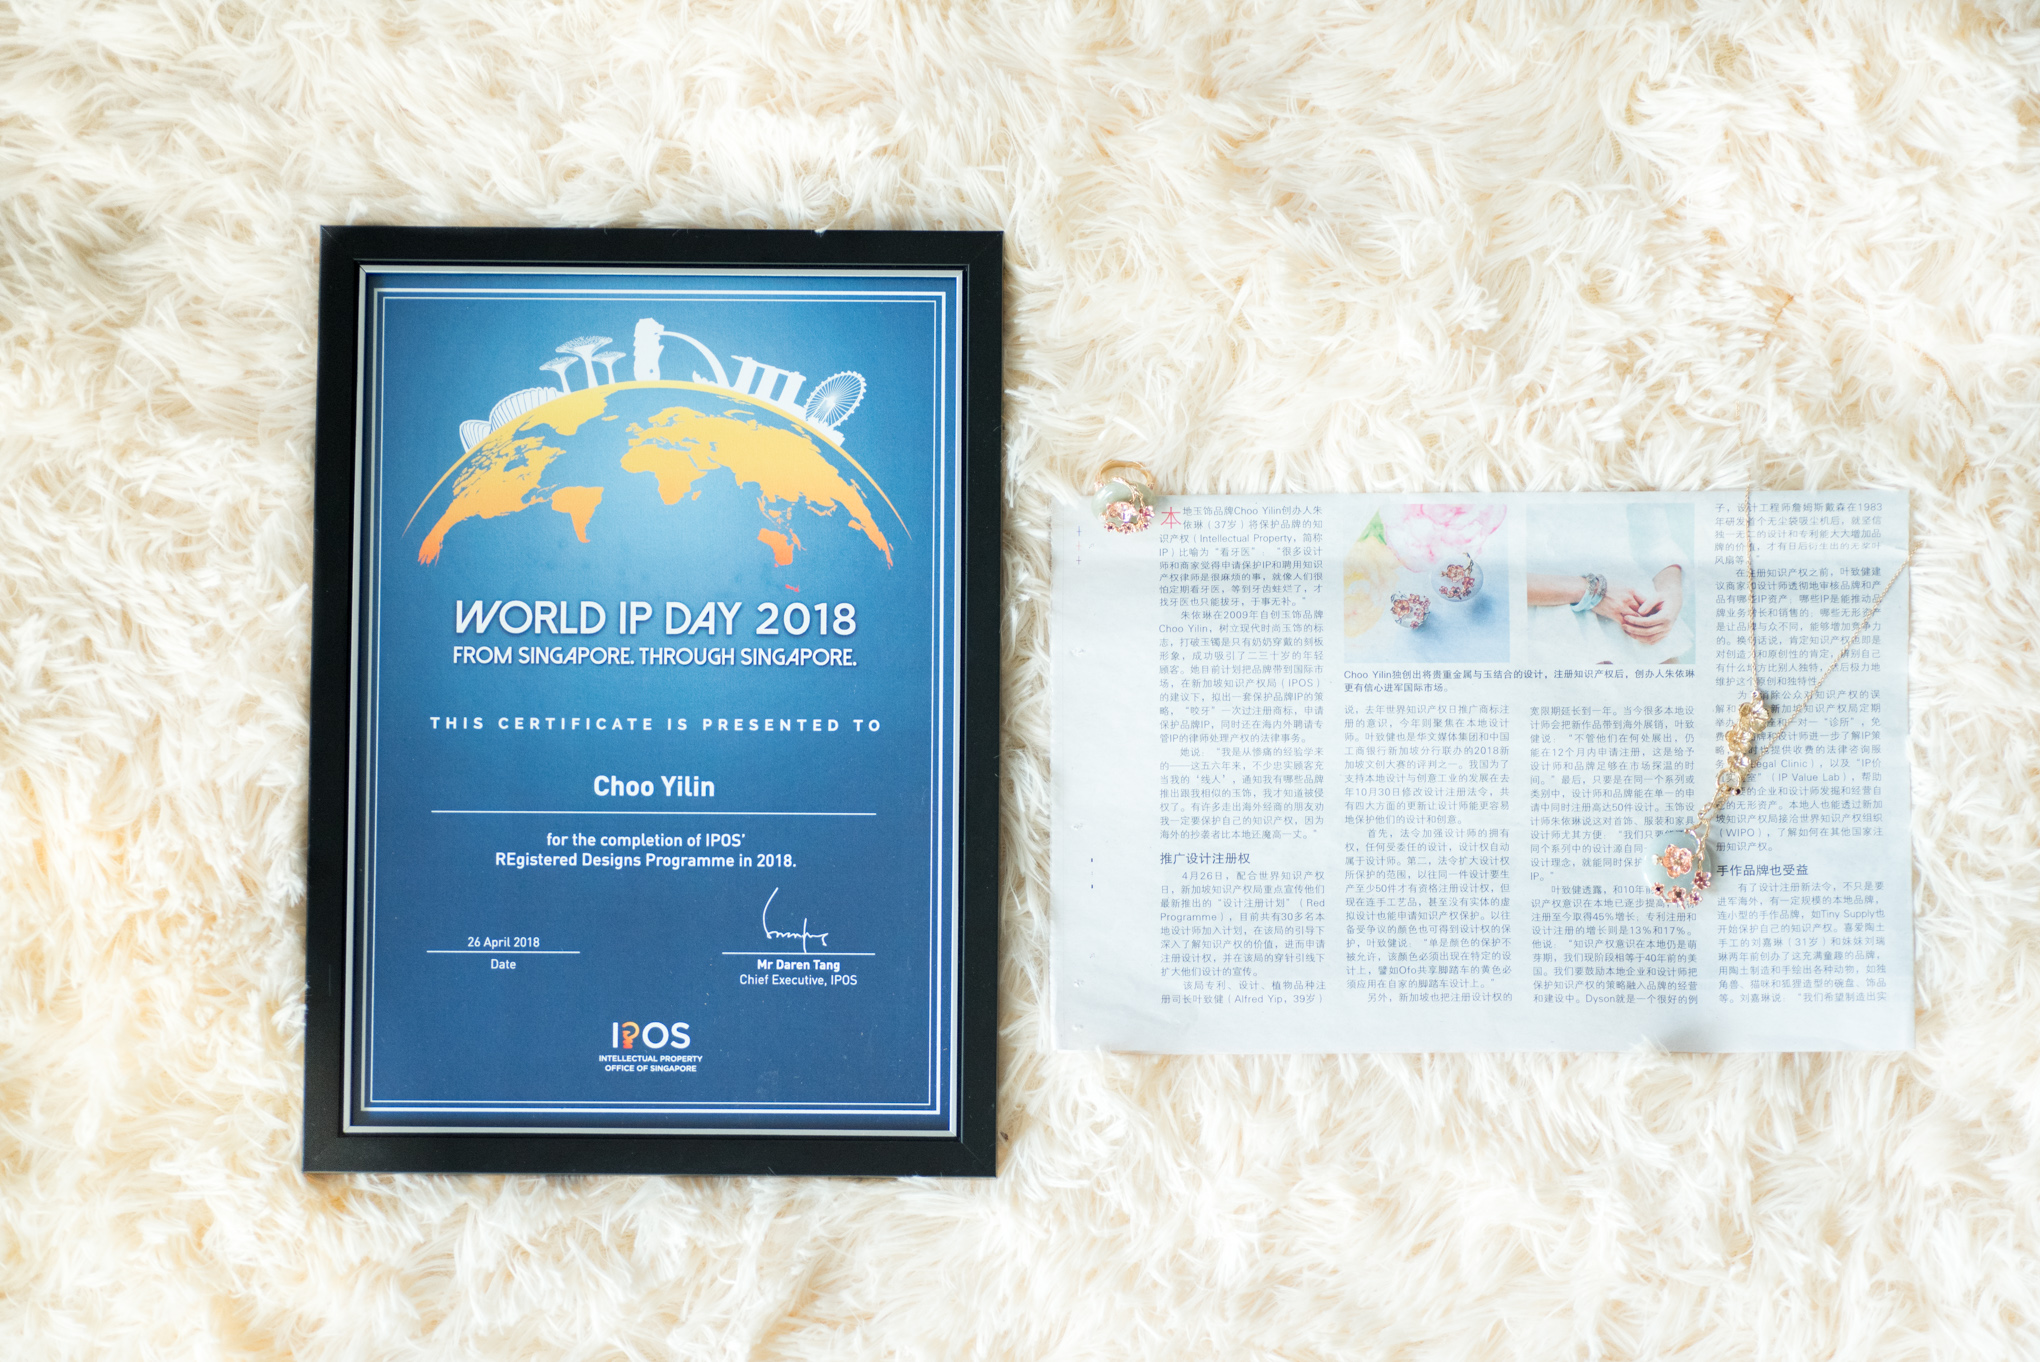 Choo Yilin World IP Day certification